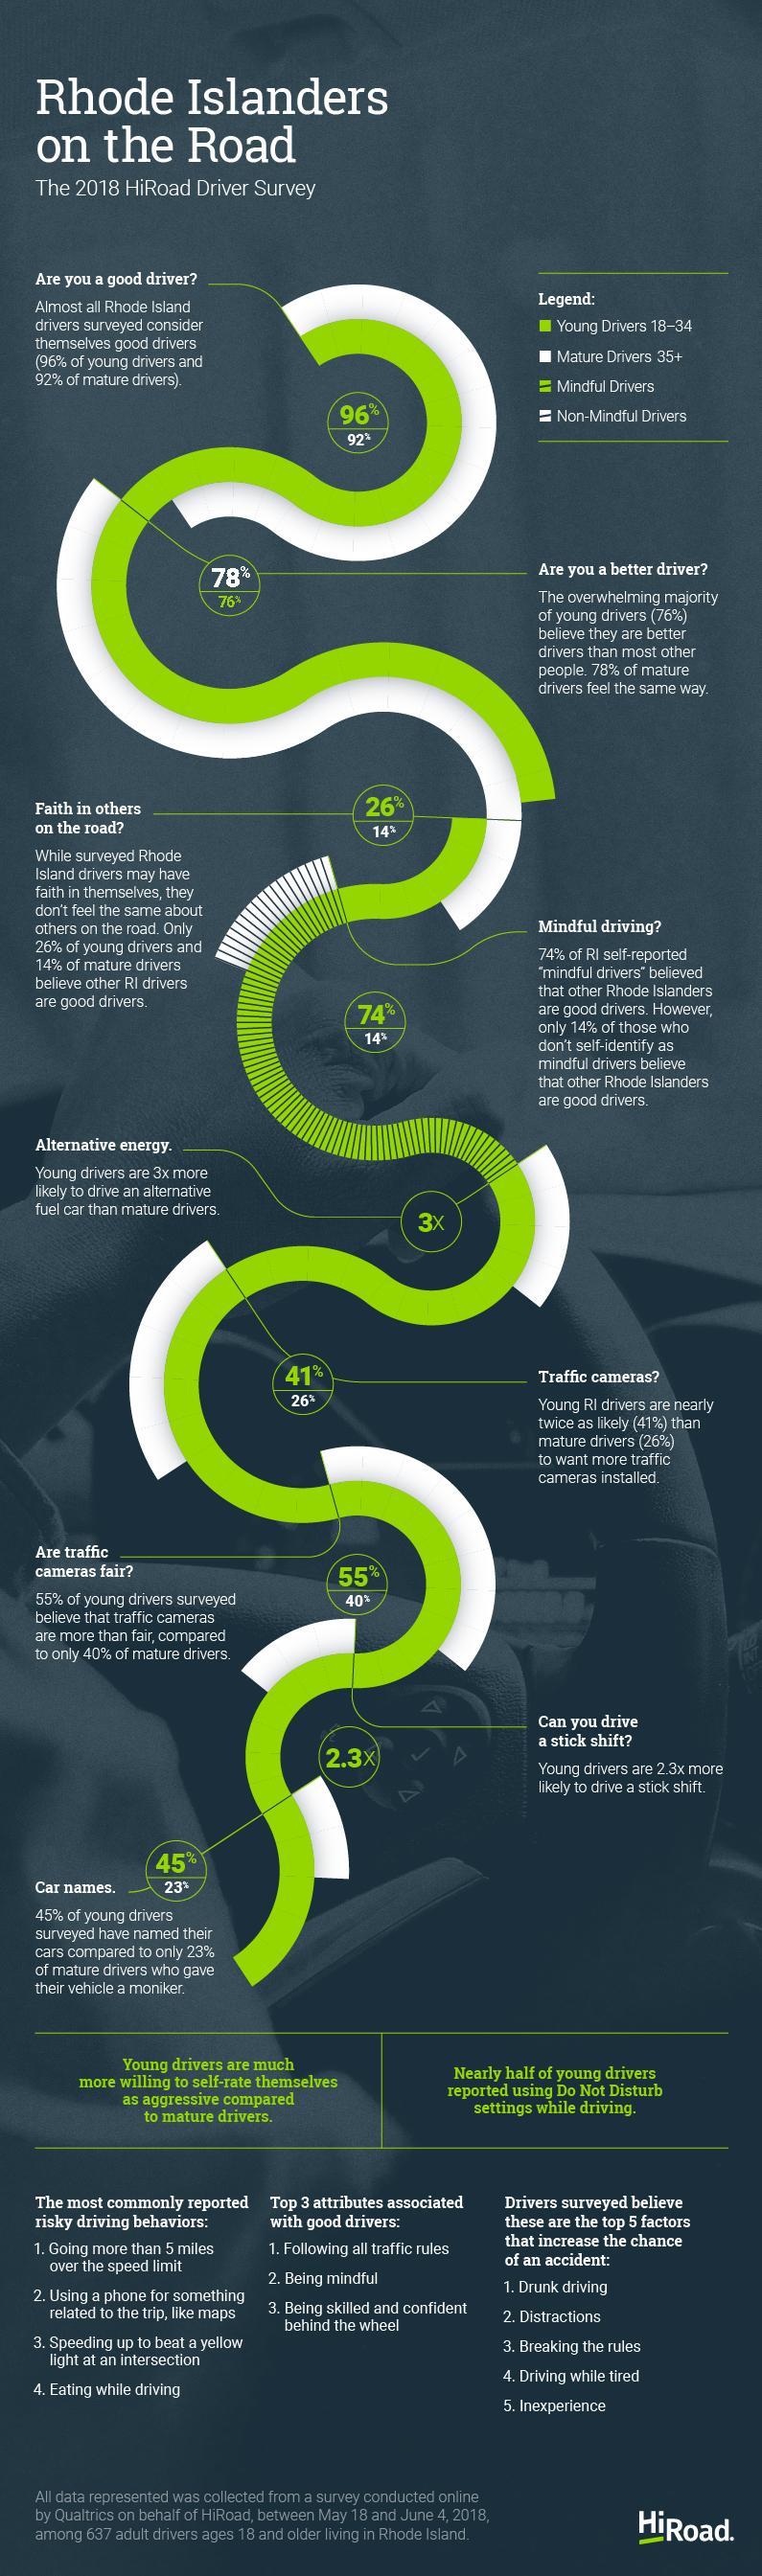 HiRoad 2018 Survey infographic